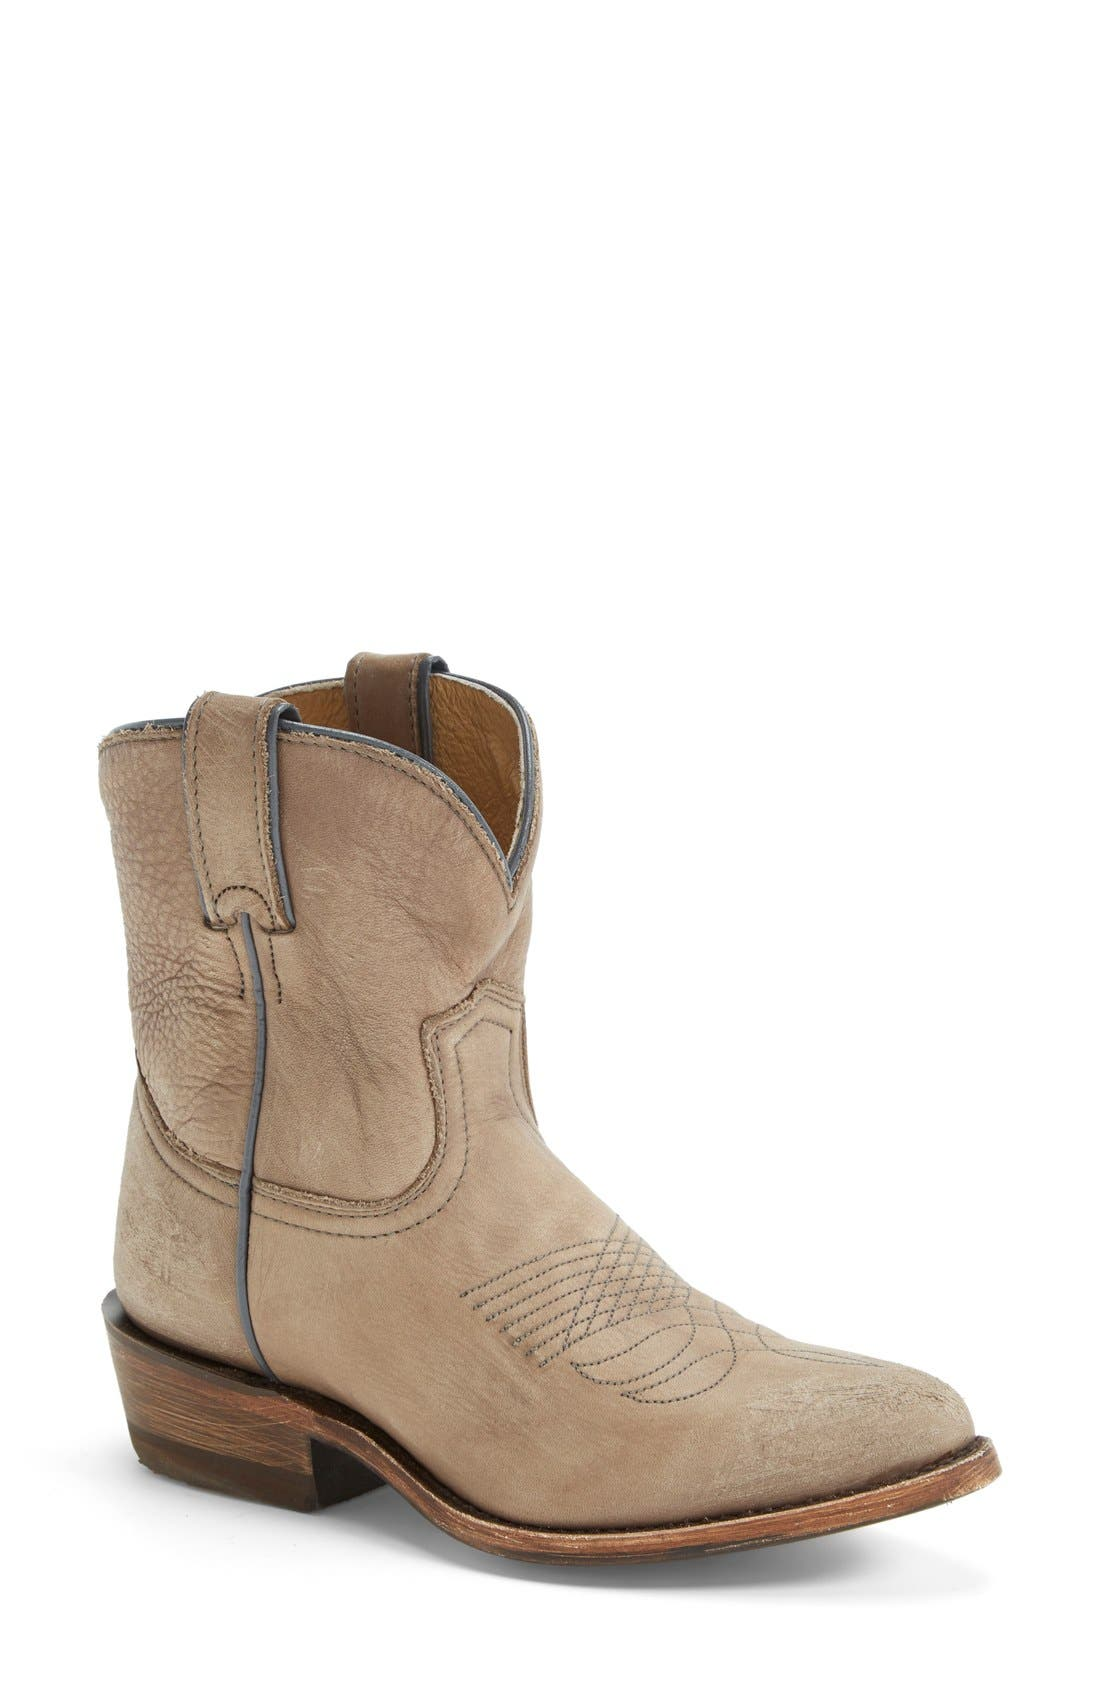 Alternate Image 1 Selected - Frye 'Billy' Short Boot (Women)